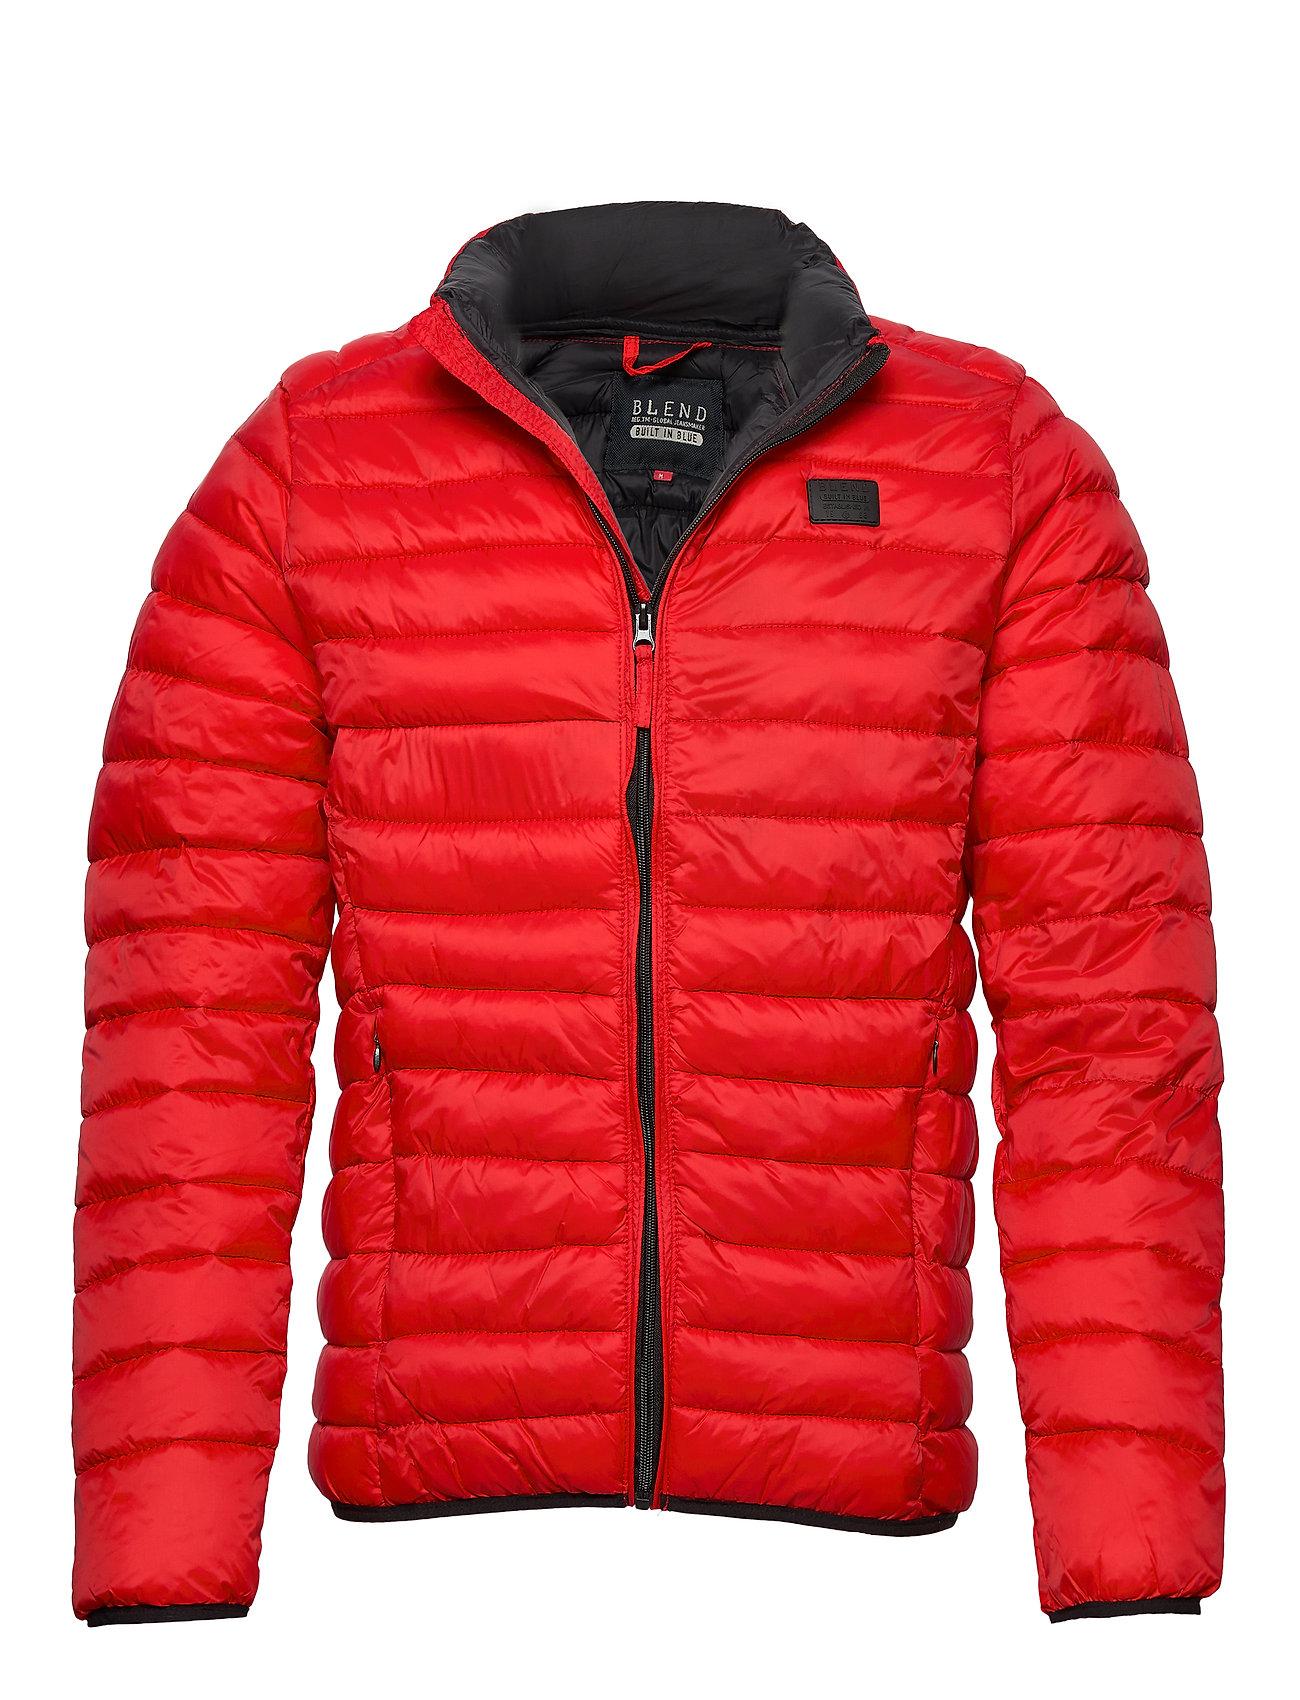 Blend Outerwear - HIGH RISK RED